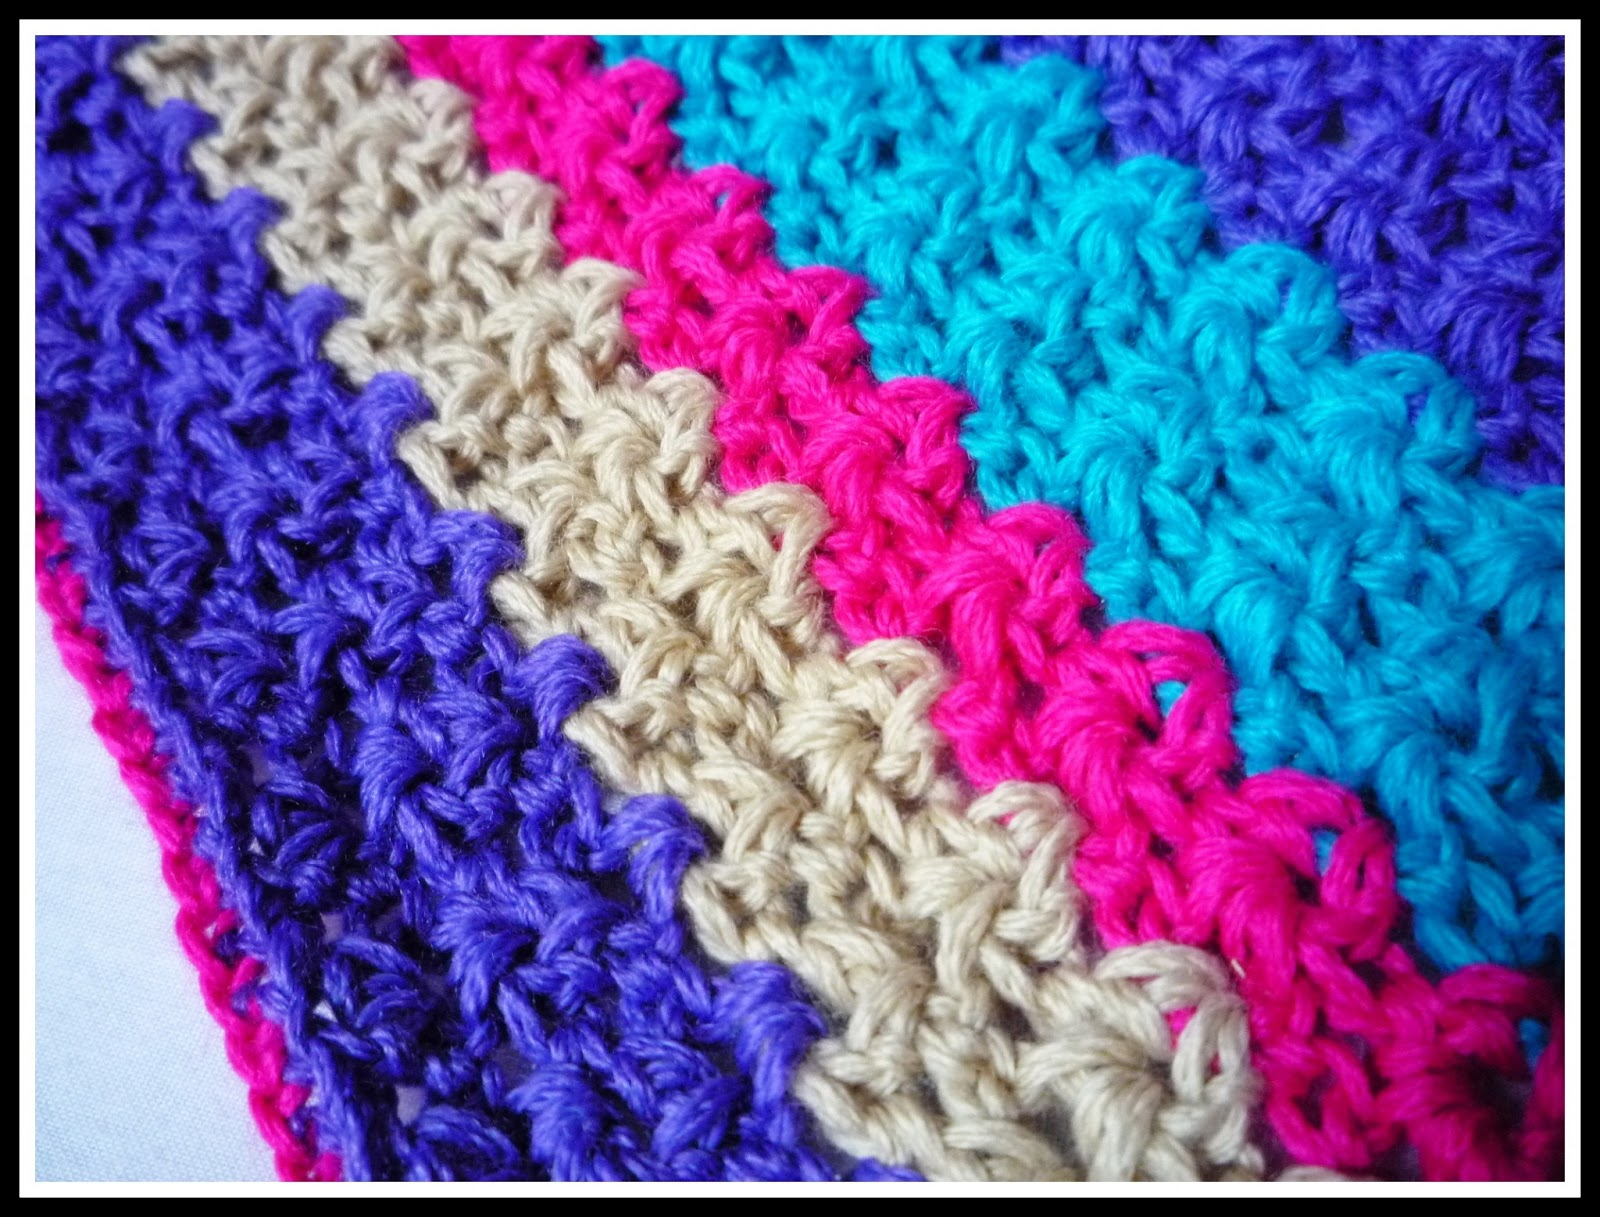 Colcha a Rayas a Crochet - Ahuyama Crochet